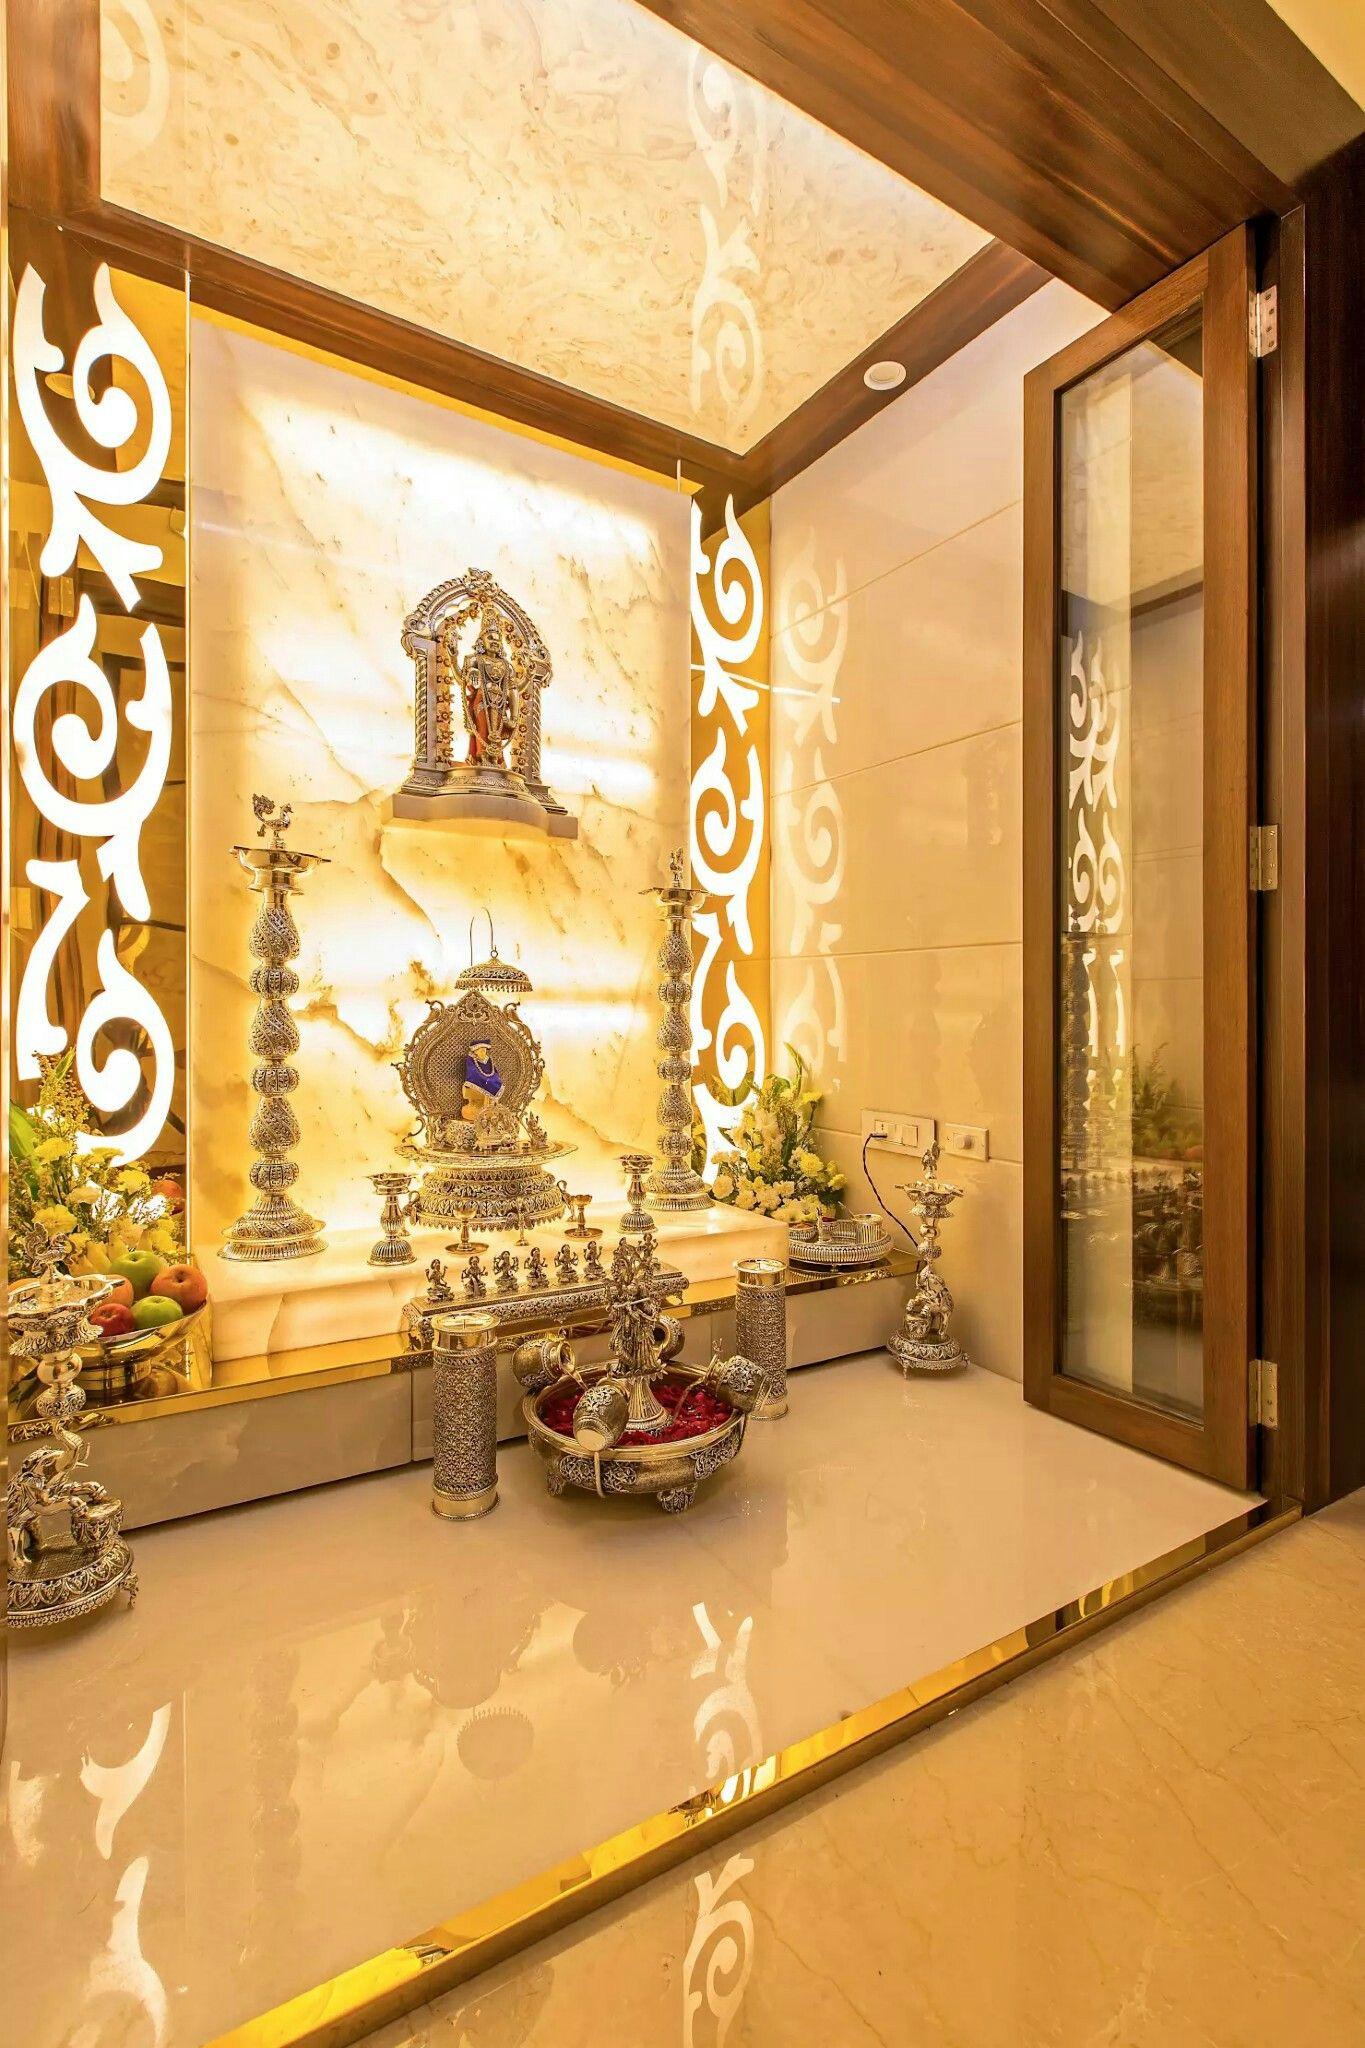 Pujaroom pooja mandir temple room home design for indian also loveindian loveindian on pinterest rh